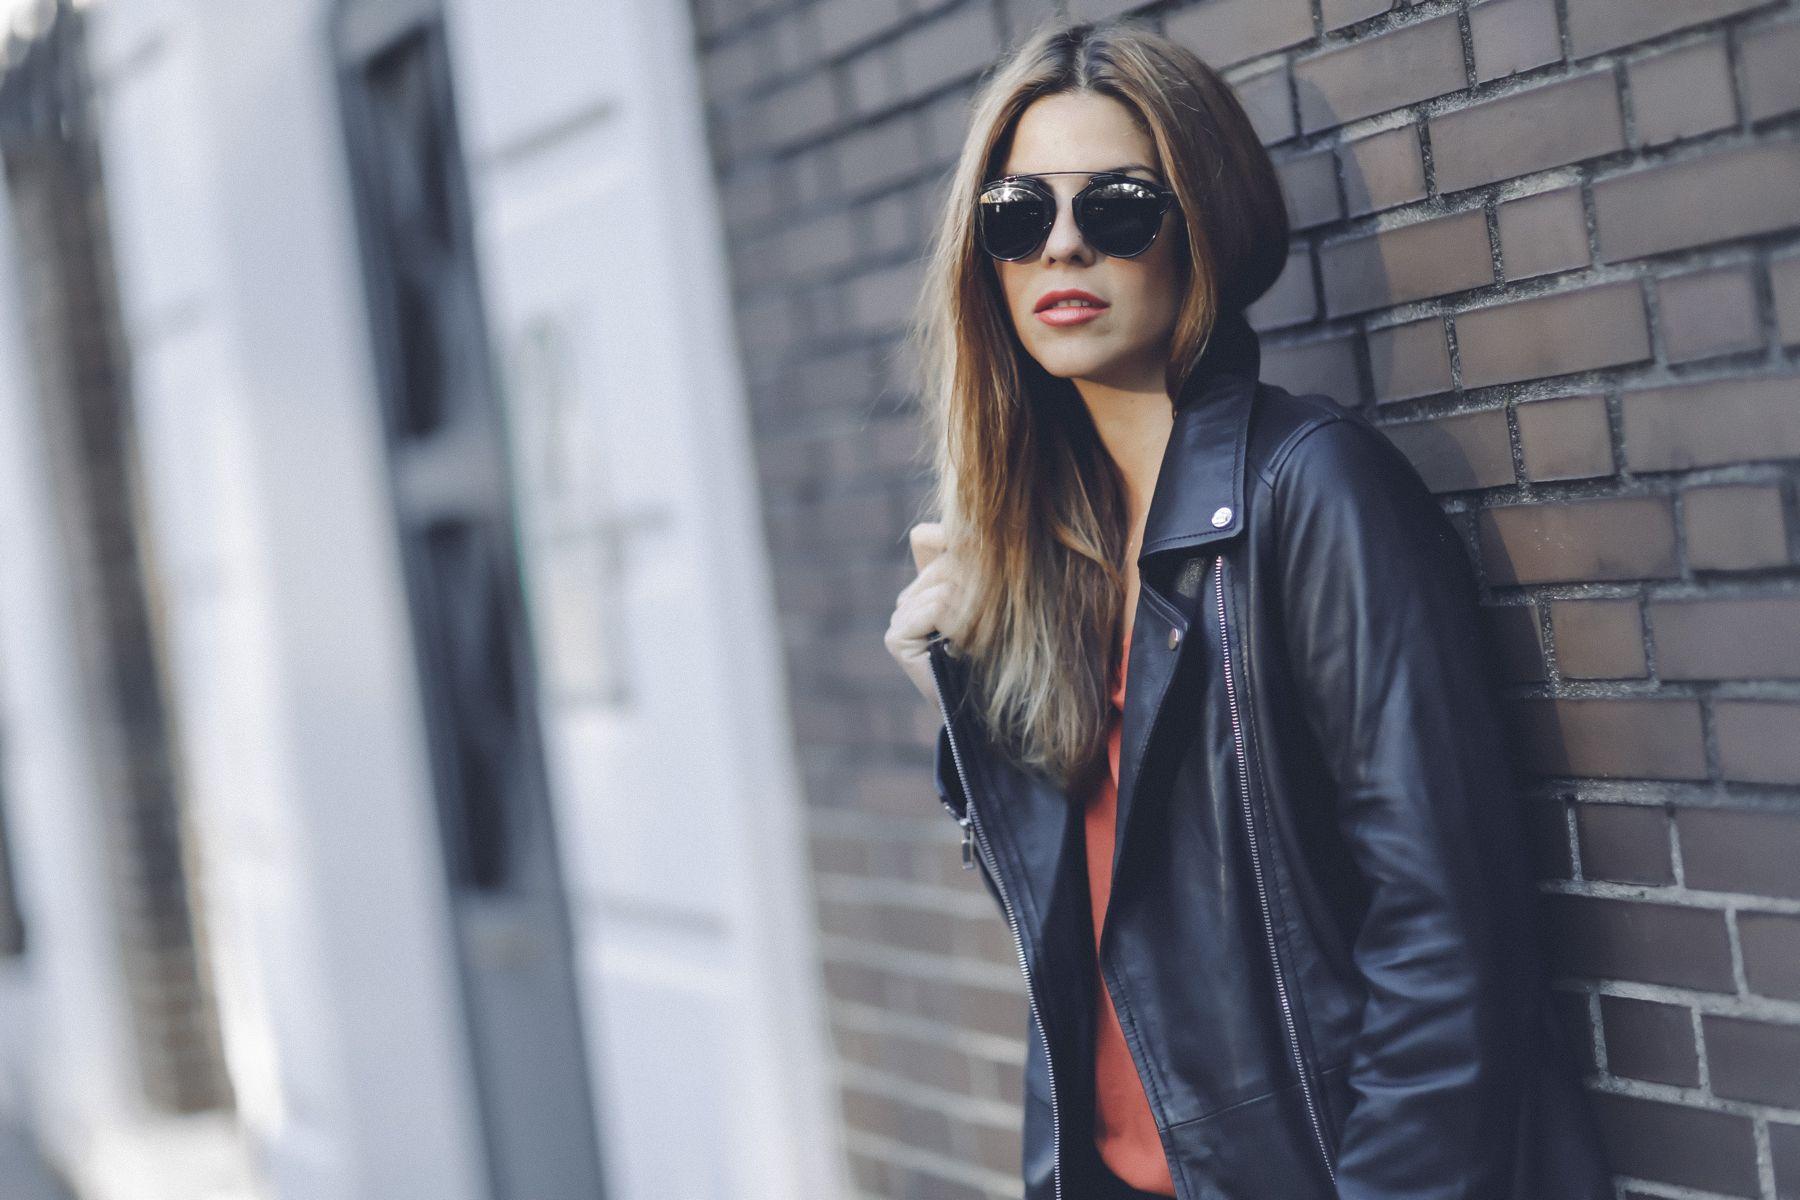 sandalias sandals mbym outfit look primavera spring camiseta zara steve madden Dior gafas de sol sunglasses street style trendy taste_4